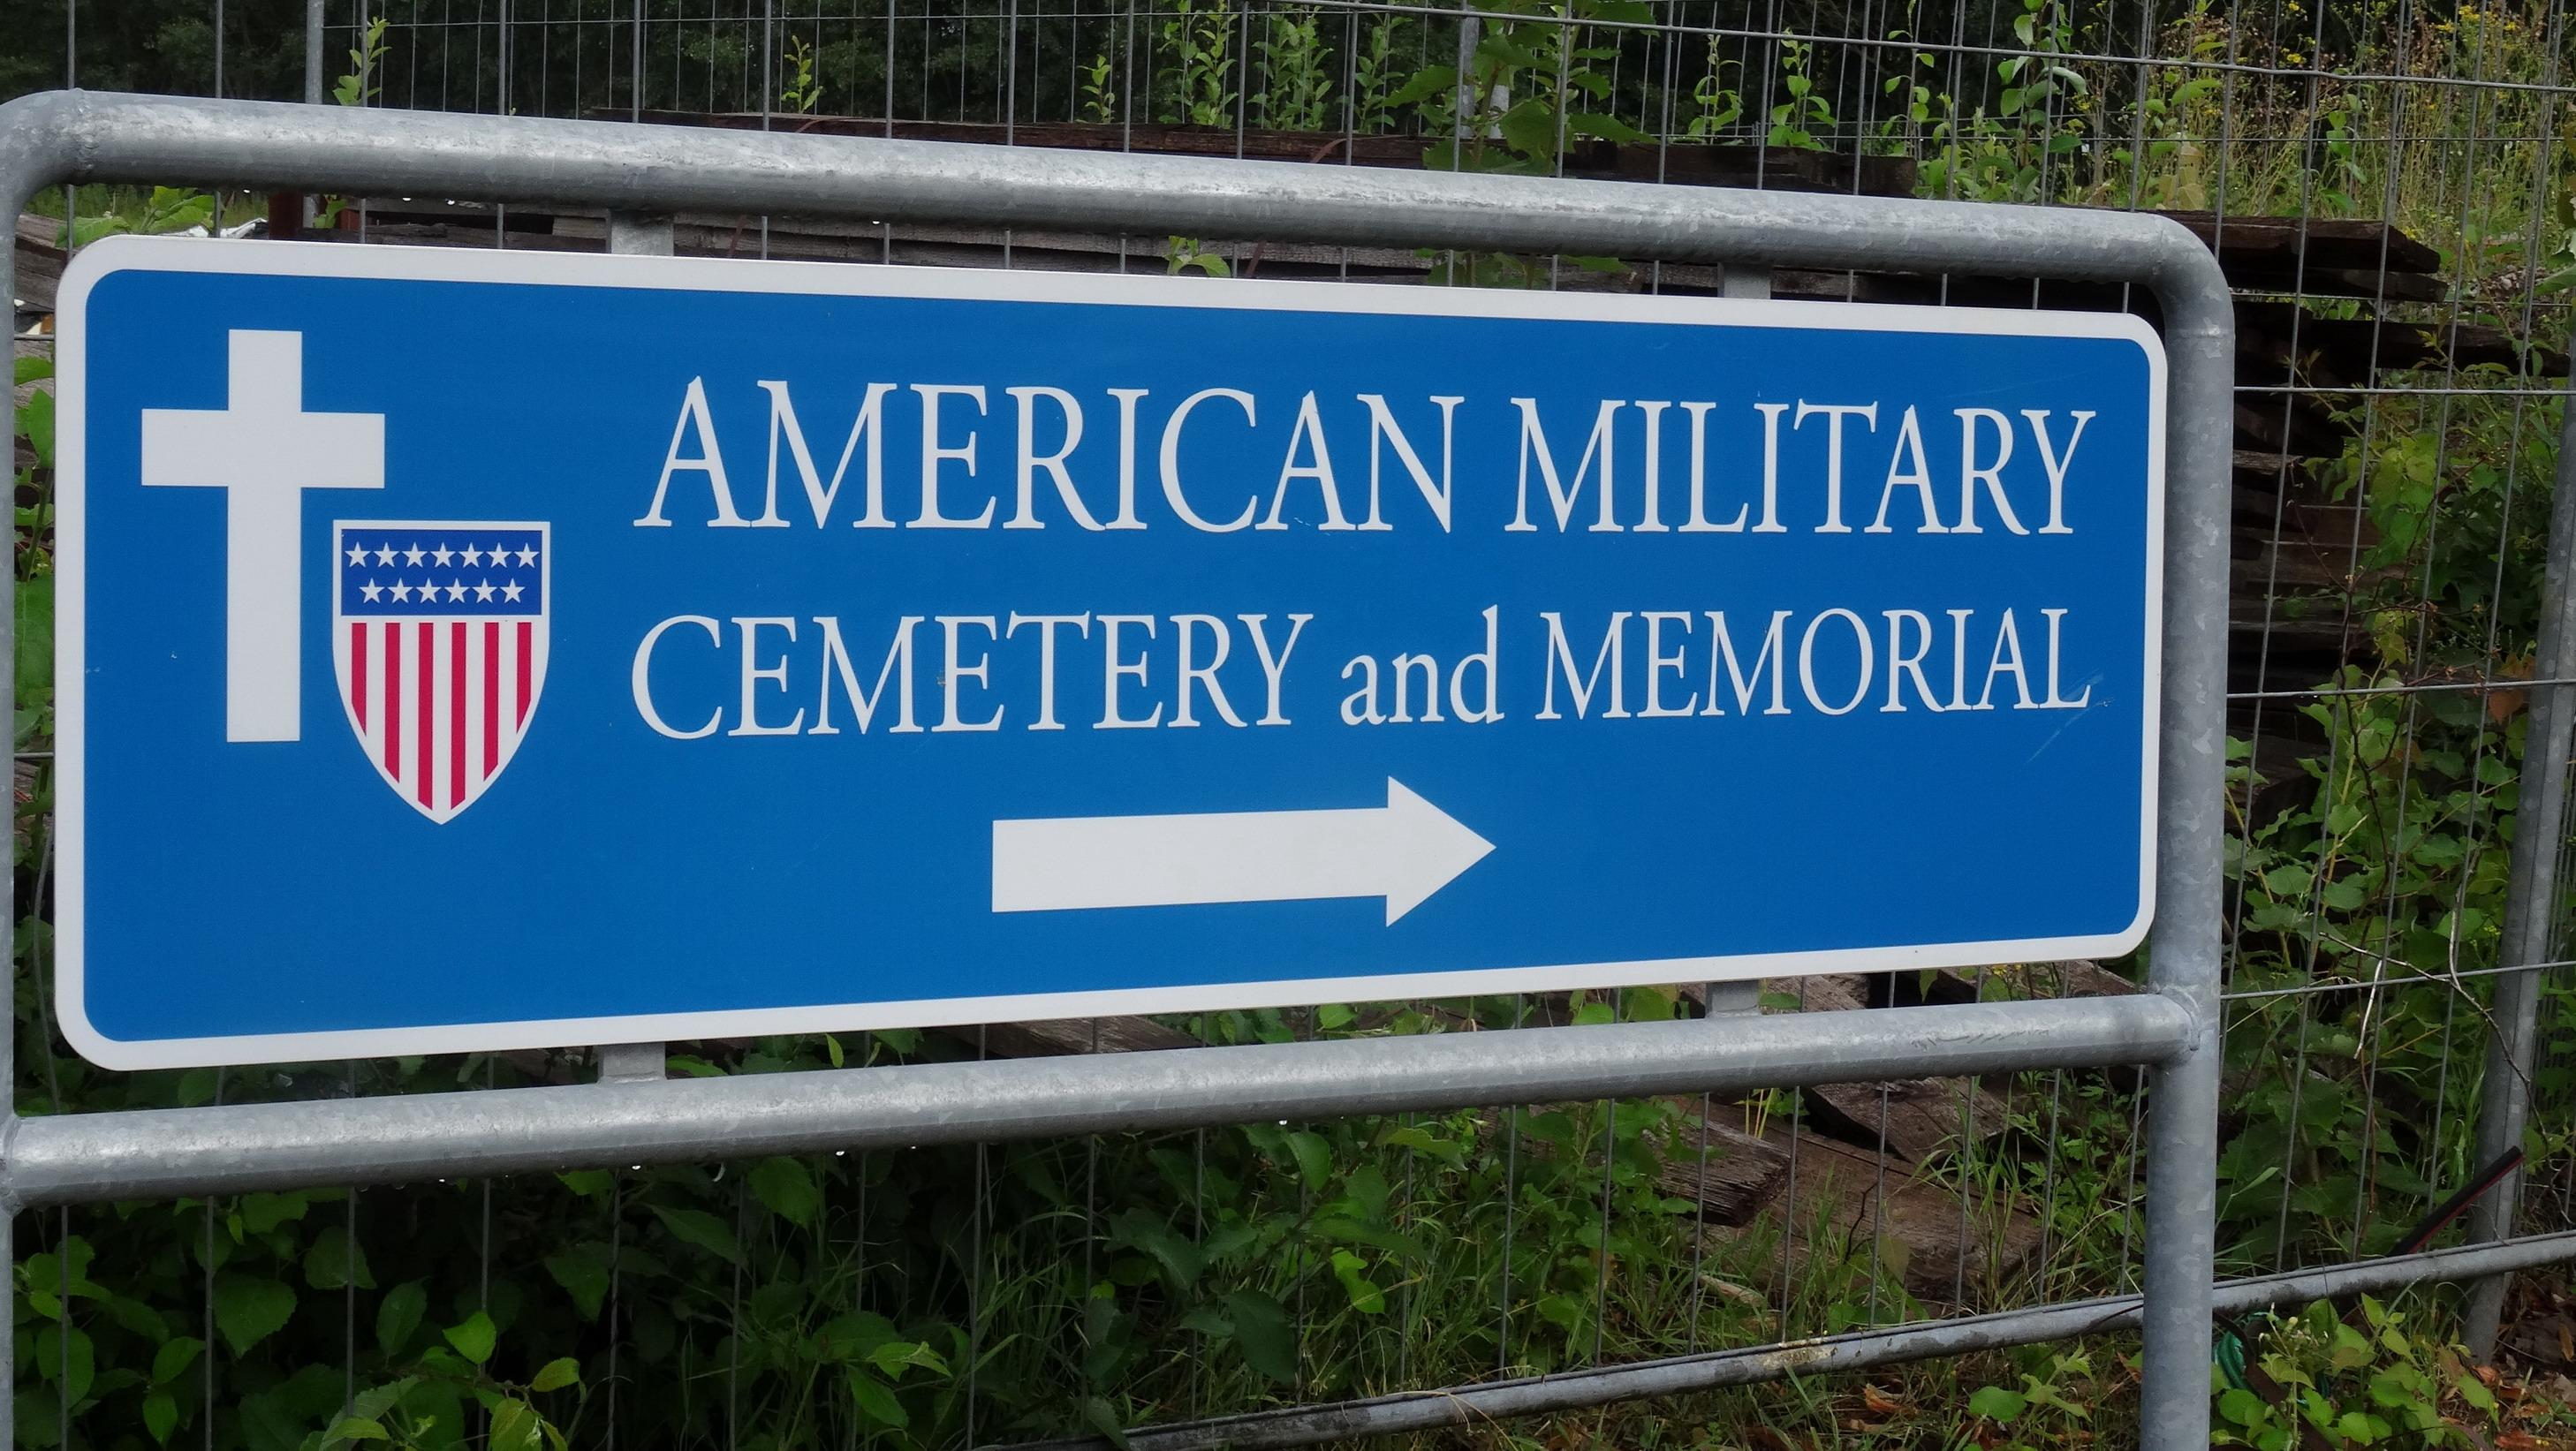 Amerikaanse militaire begraafplaats in Luxemburg